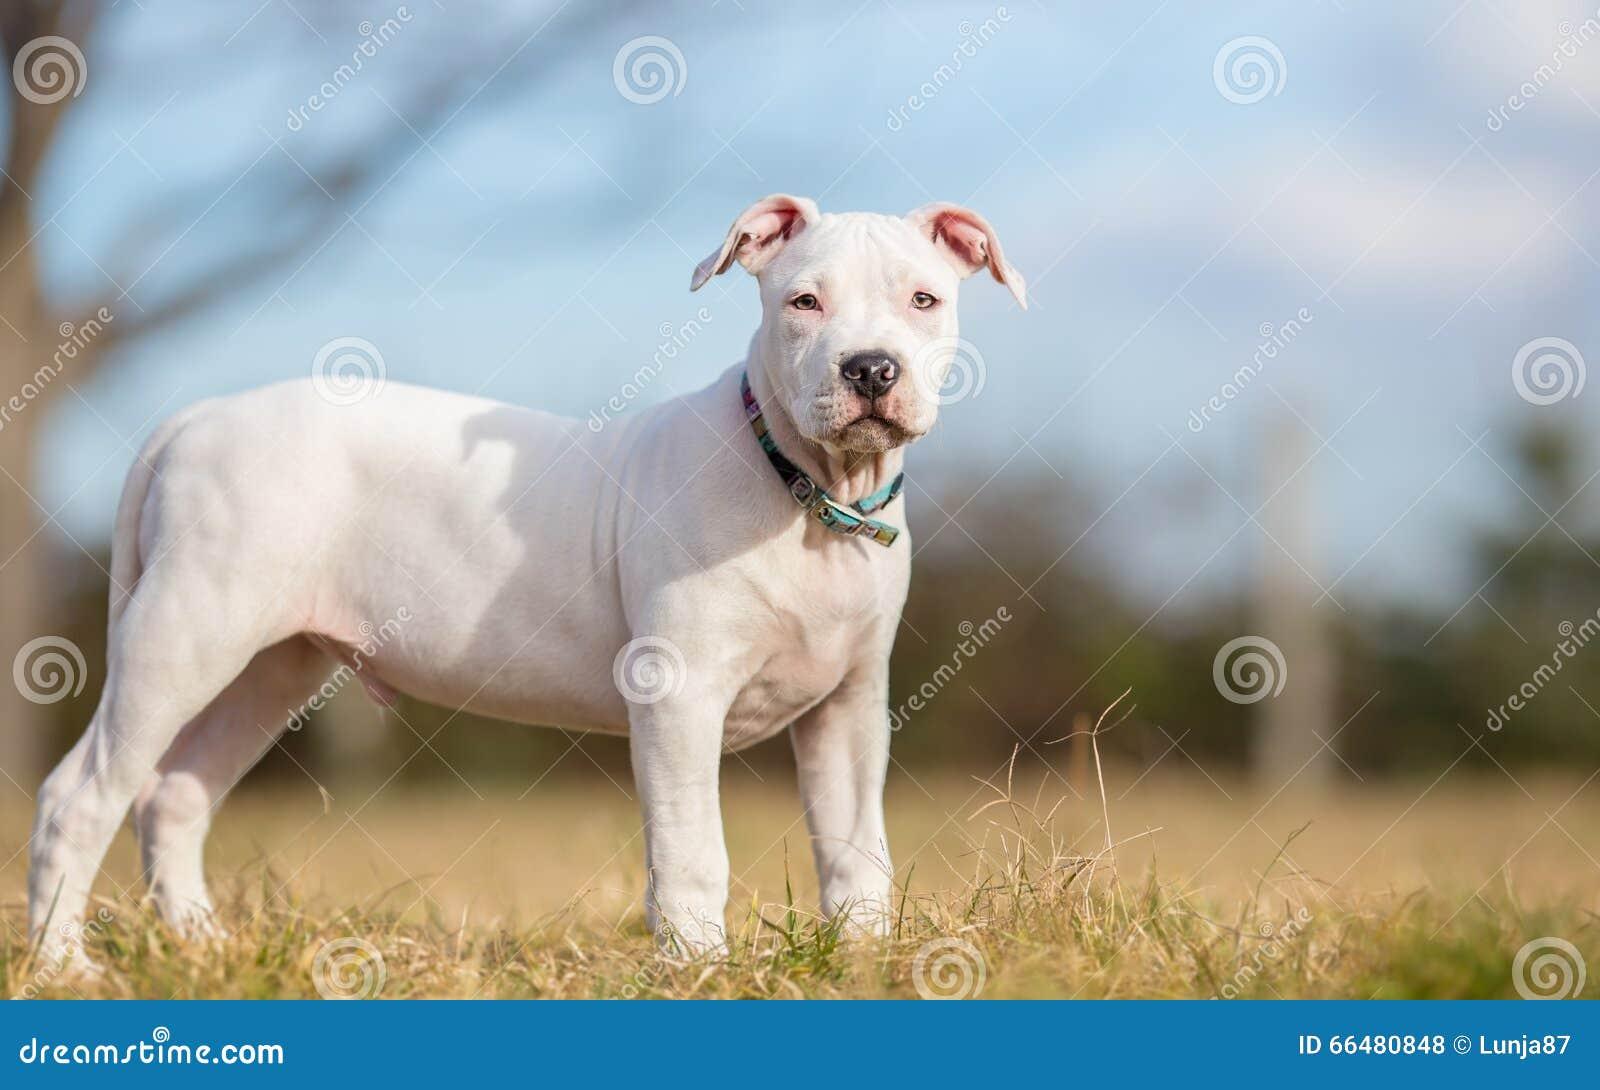 Daftar Harga White American Termurah 2018 Standard Seat Cover Mtc 0612 Pp Scv080610 P Staffordshire Terrier Www Pixshark